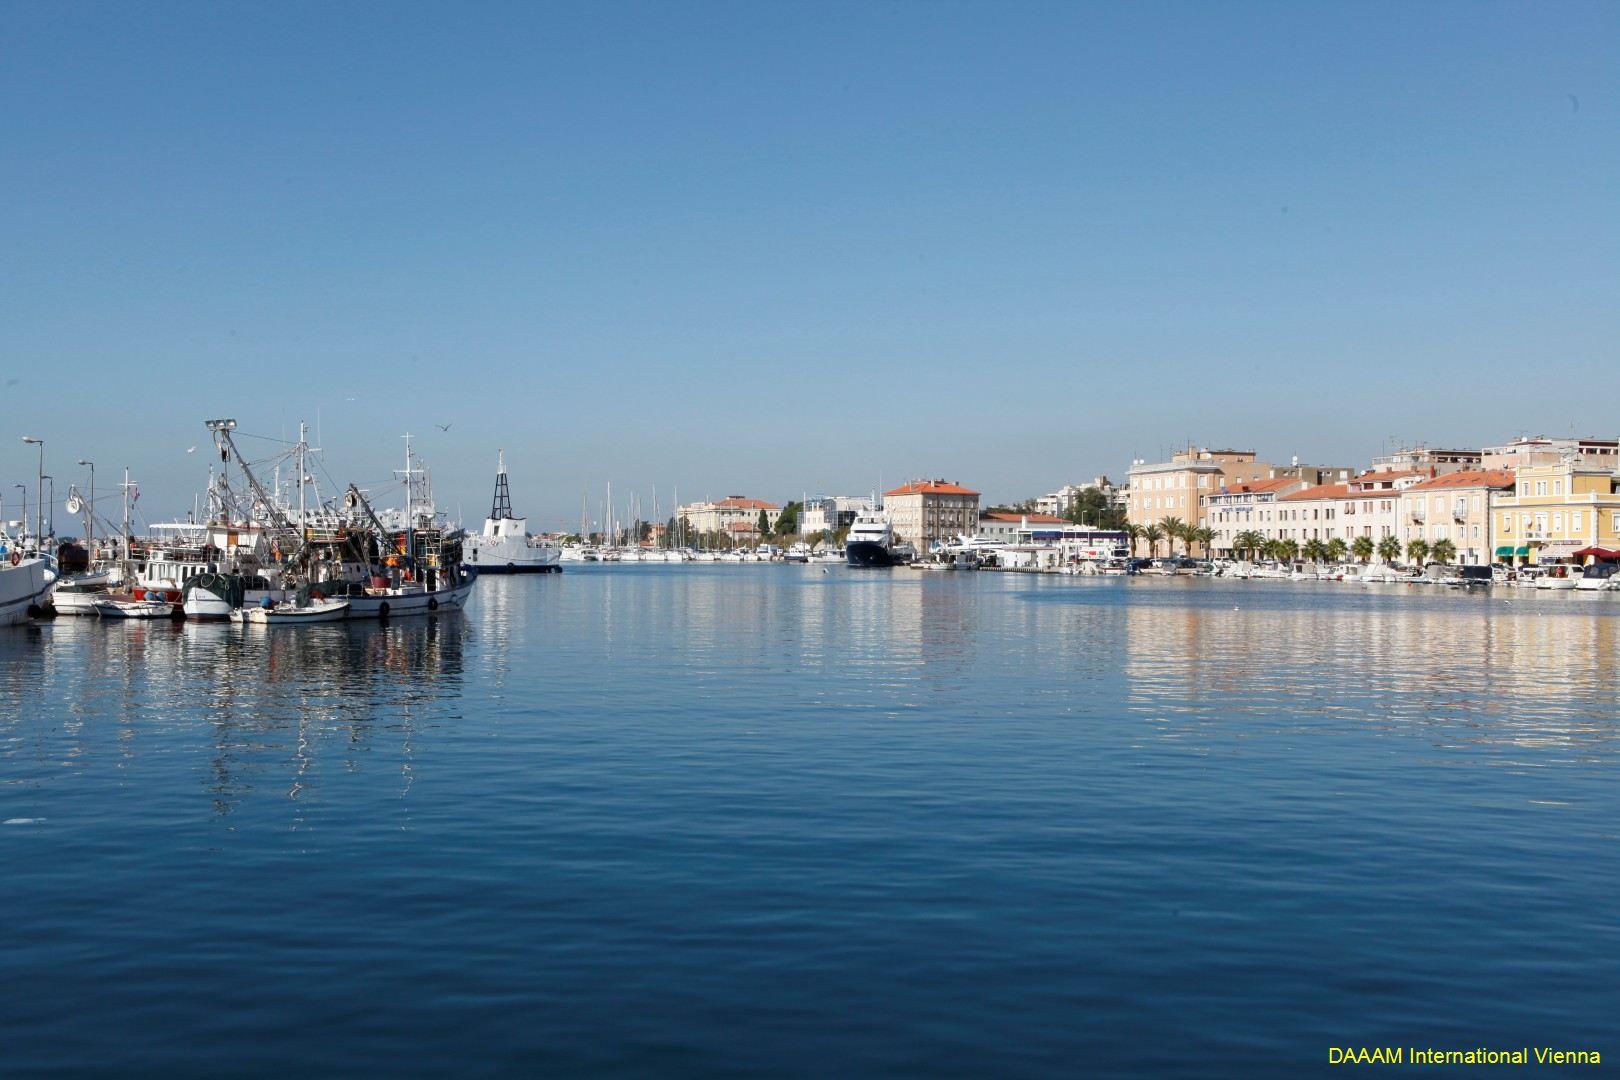 DAAAM_2012_Zadar_00_Zadar_City_002